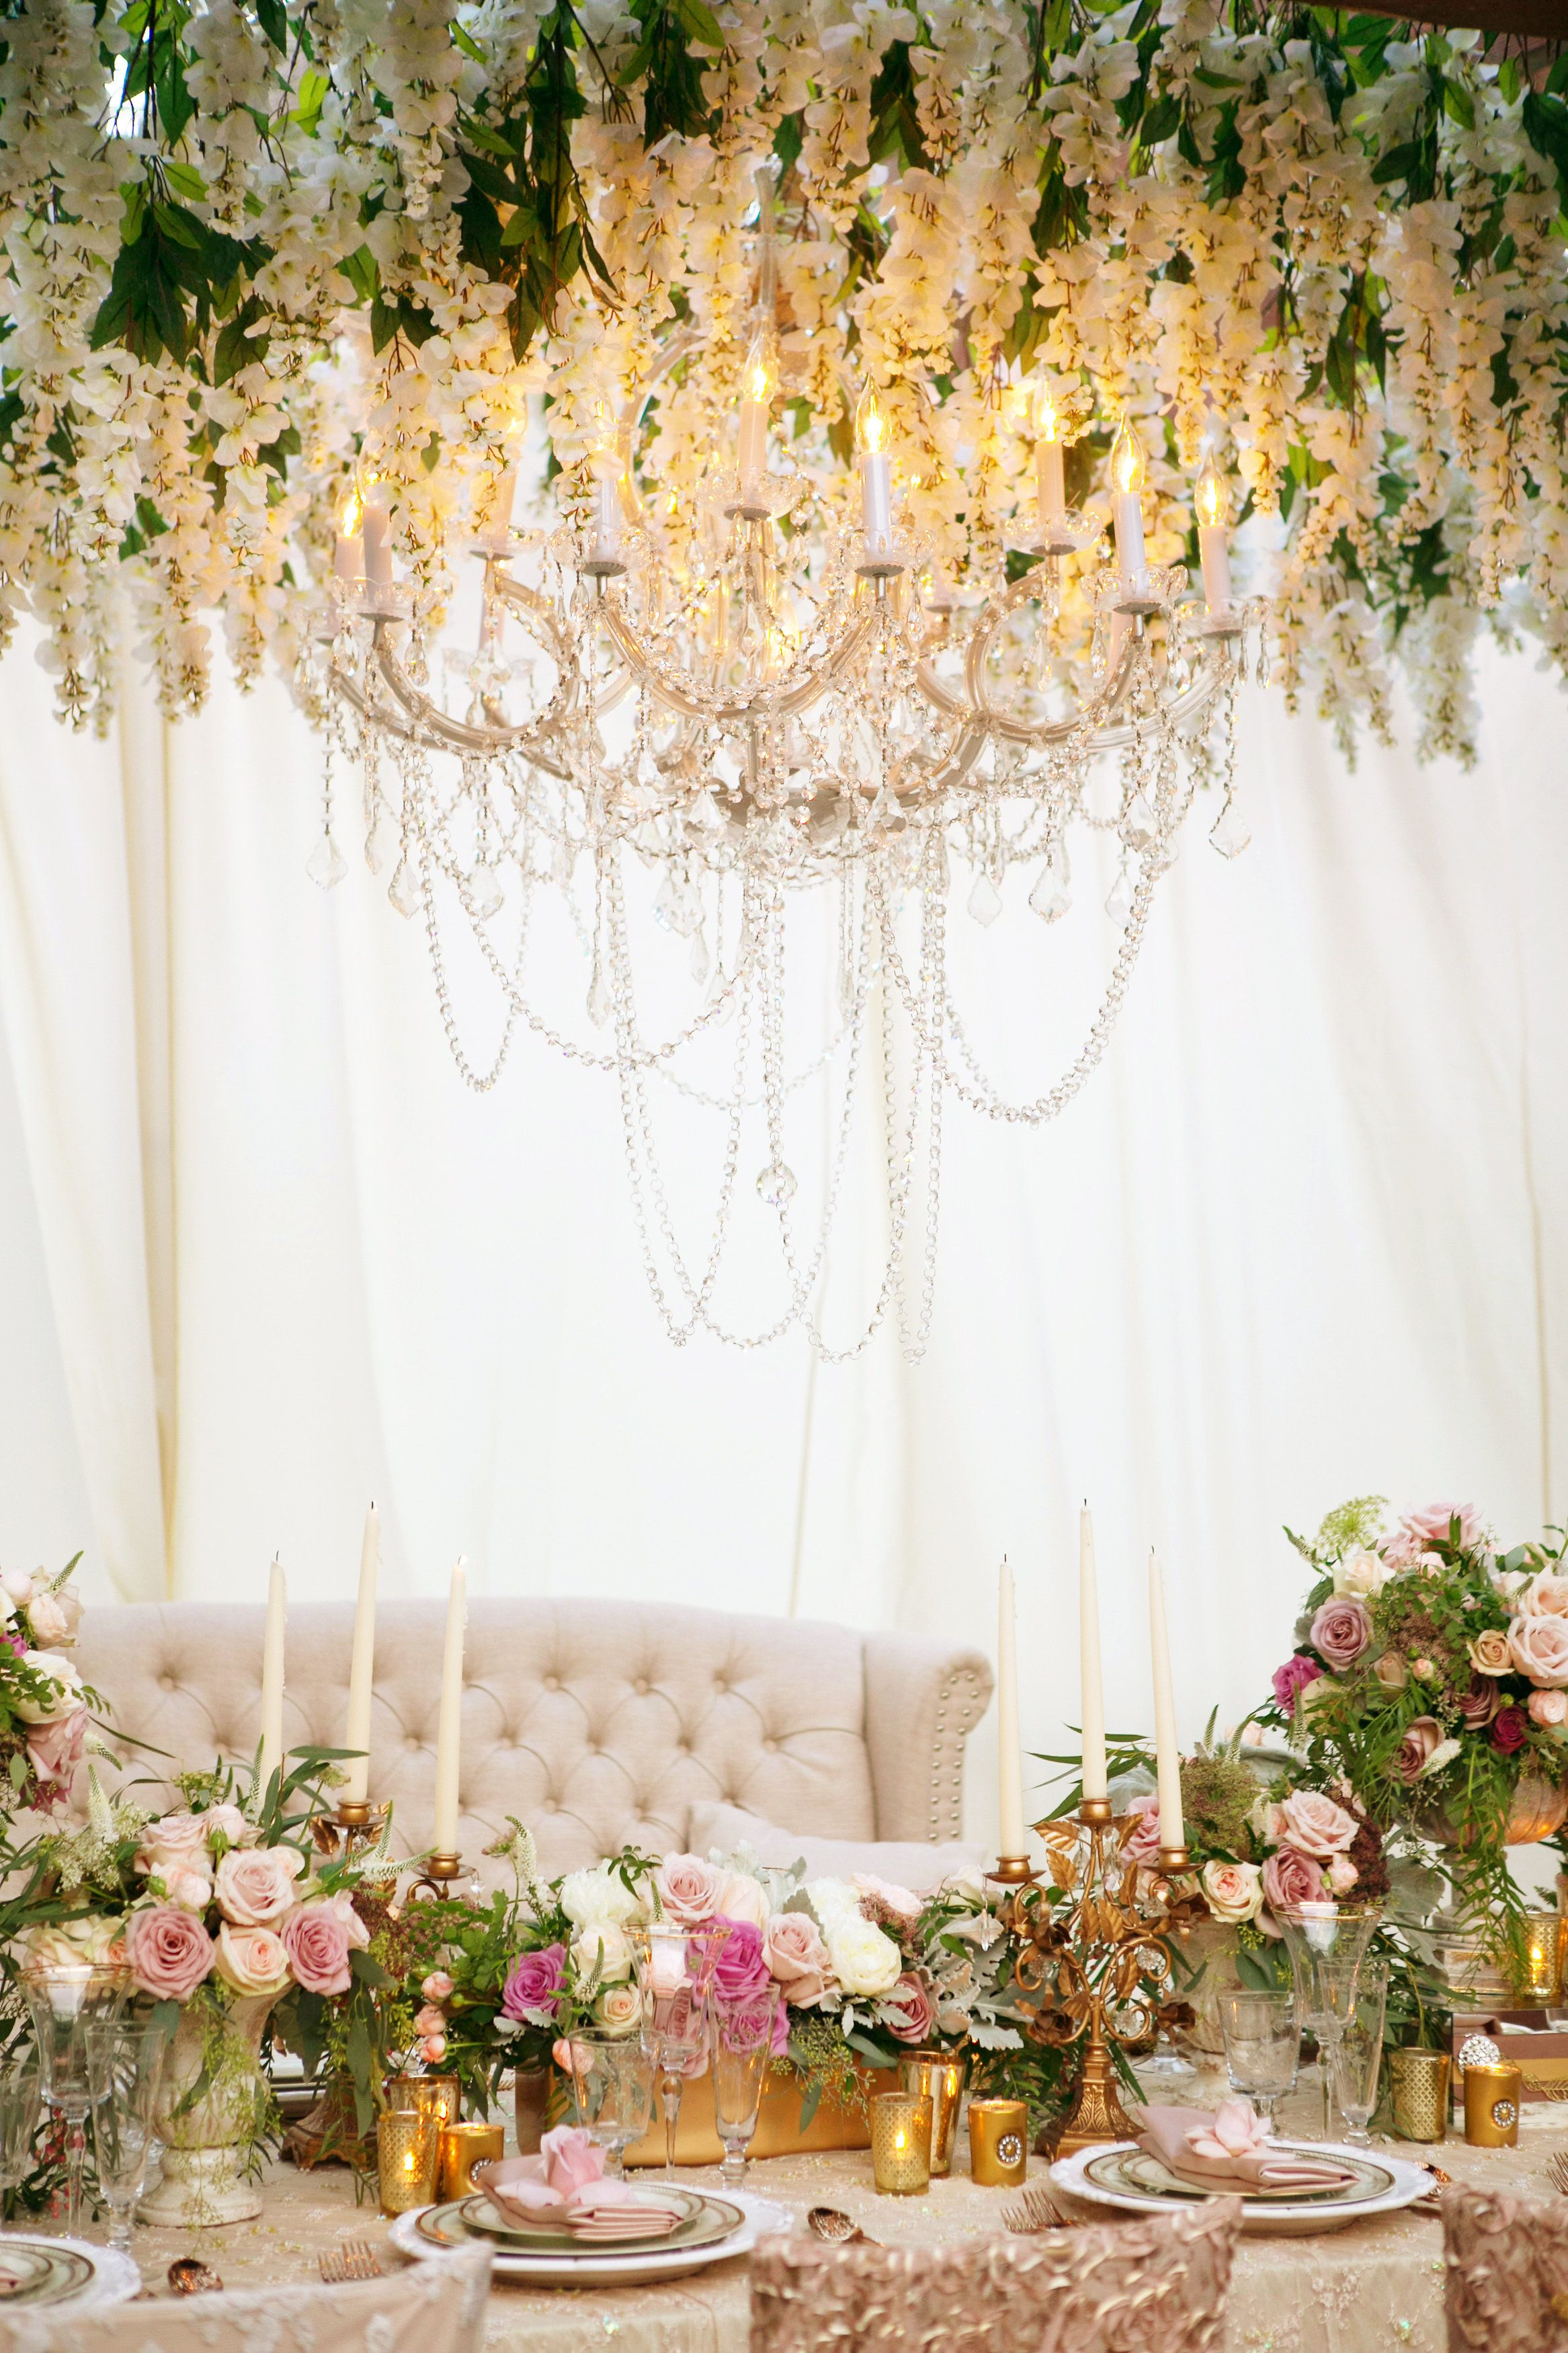 Wedding decorations on tables  Love this enchanting wedding decor unique chandelier disney